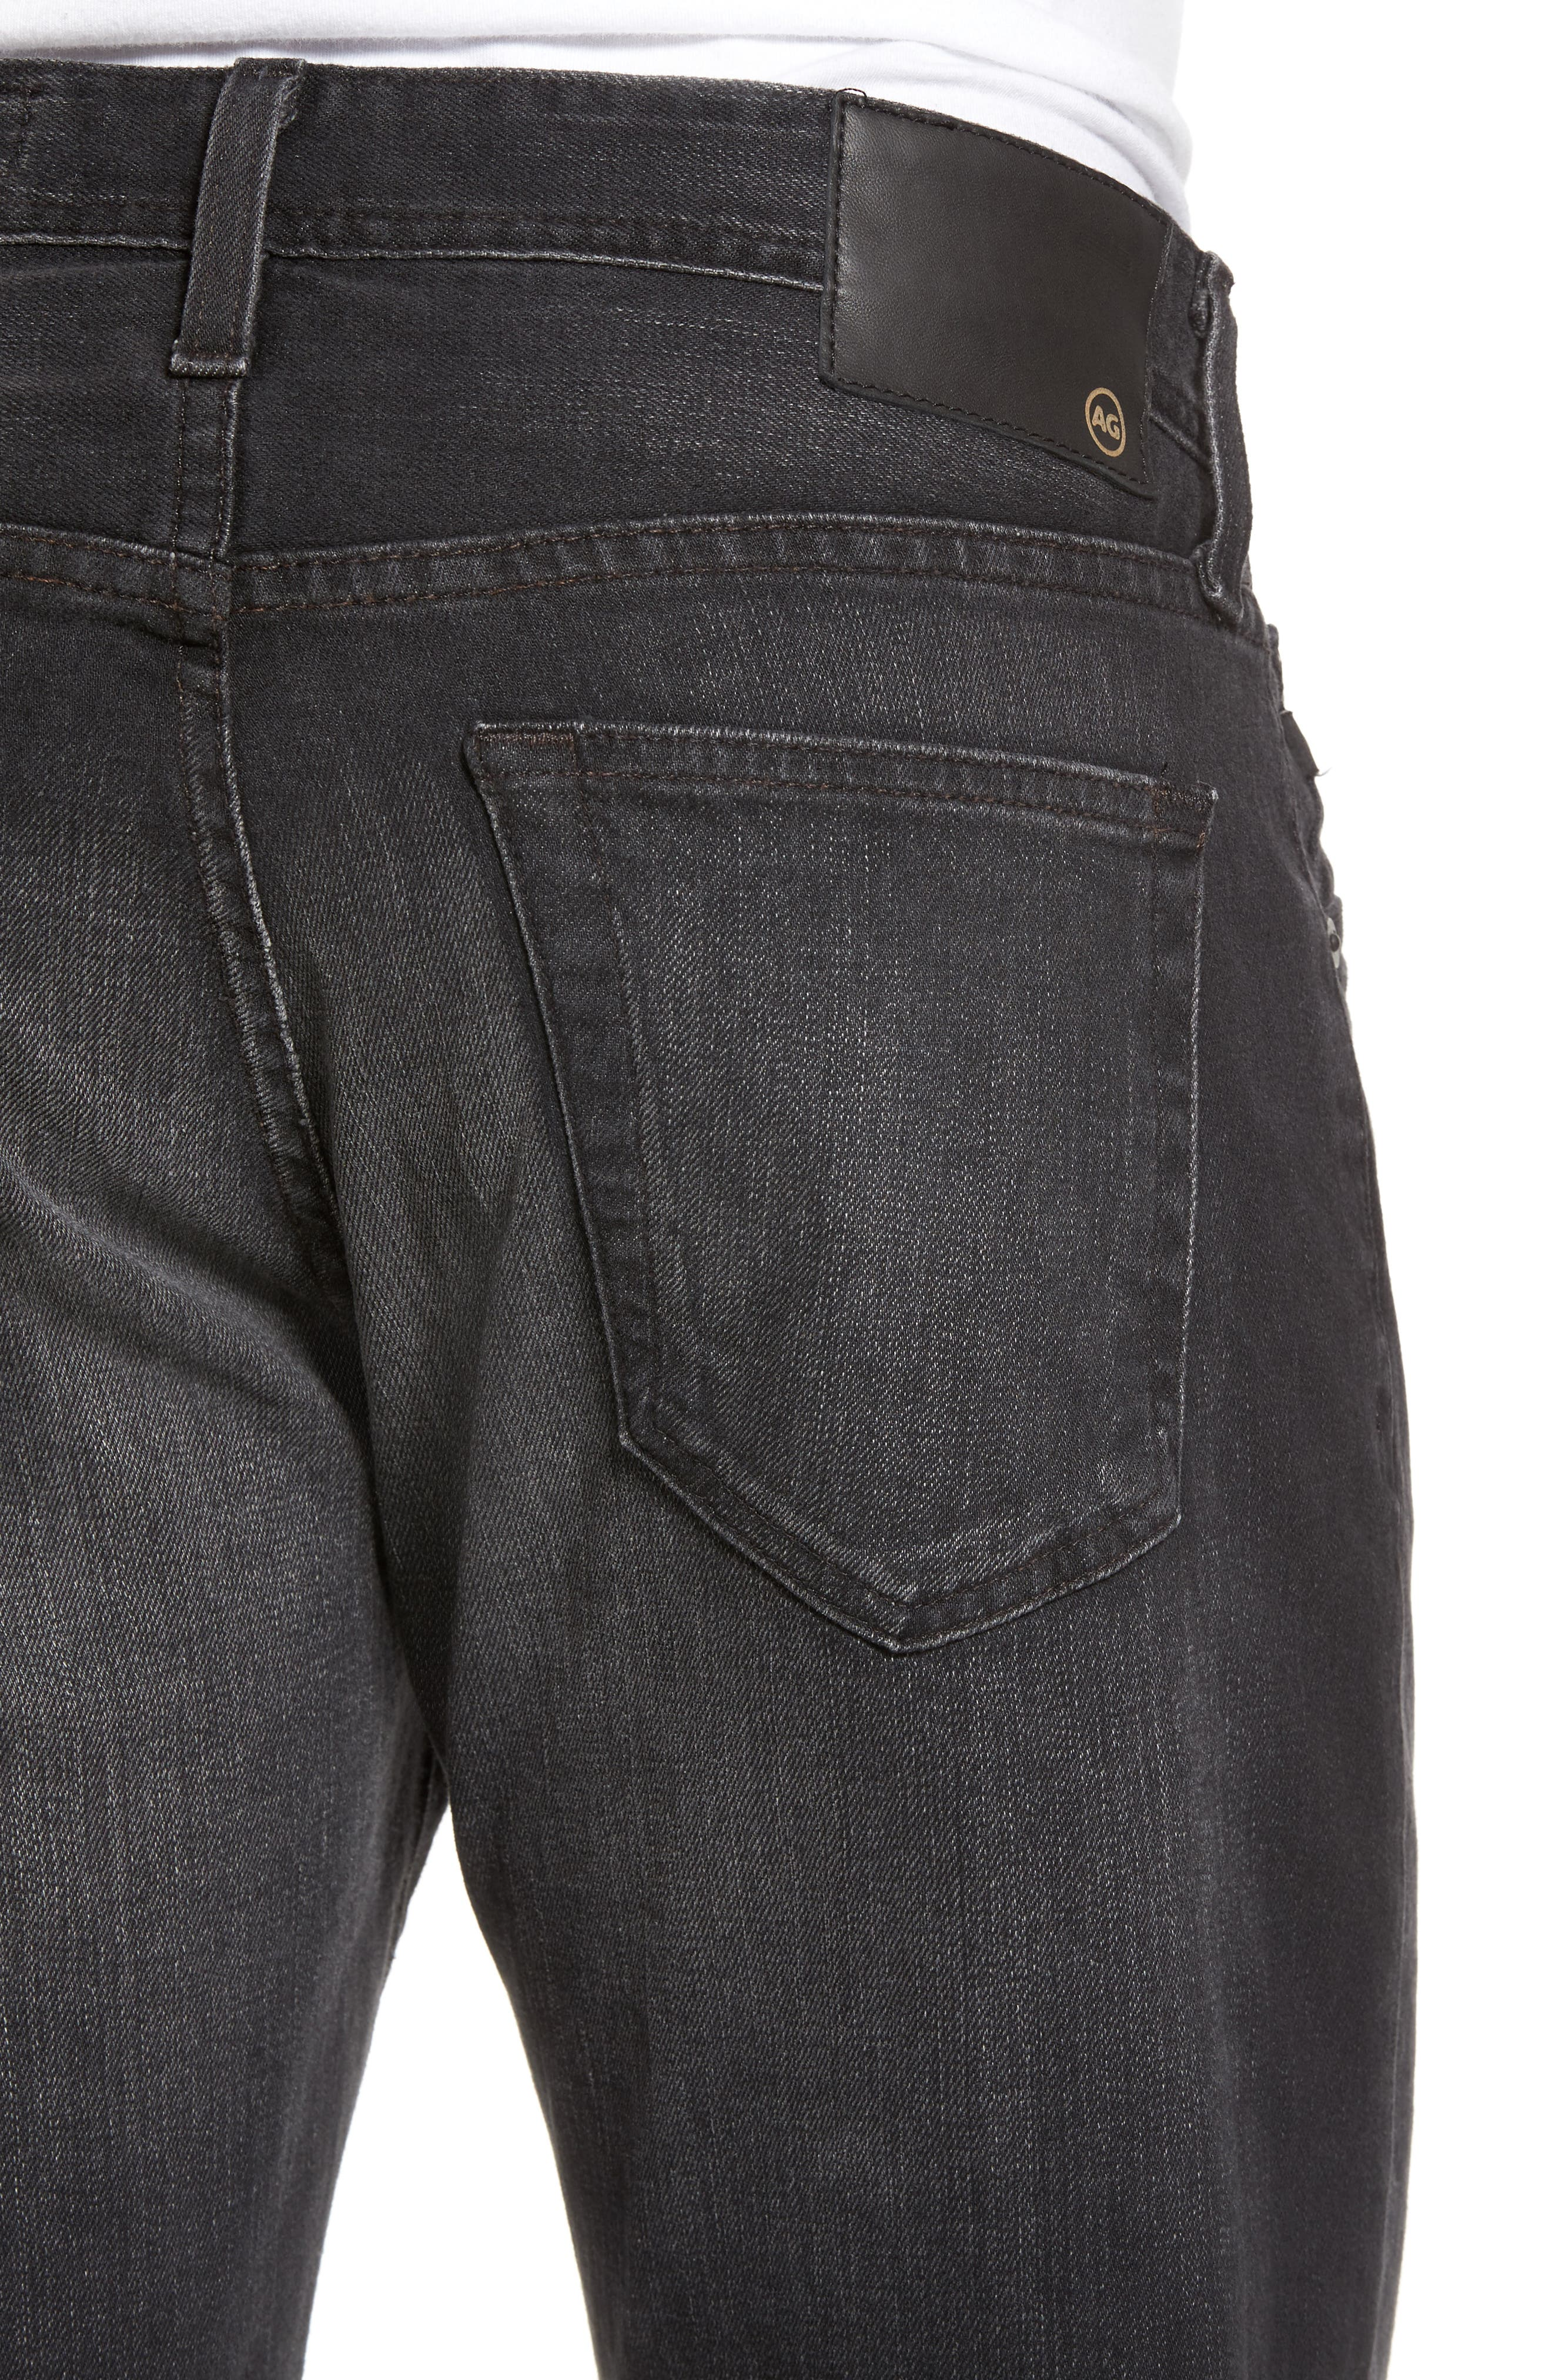 Tellis Modern Slim Fit Jeans,                             Alternate thumbnail 4, color,                             Smudged Black